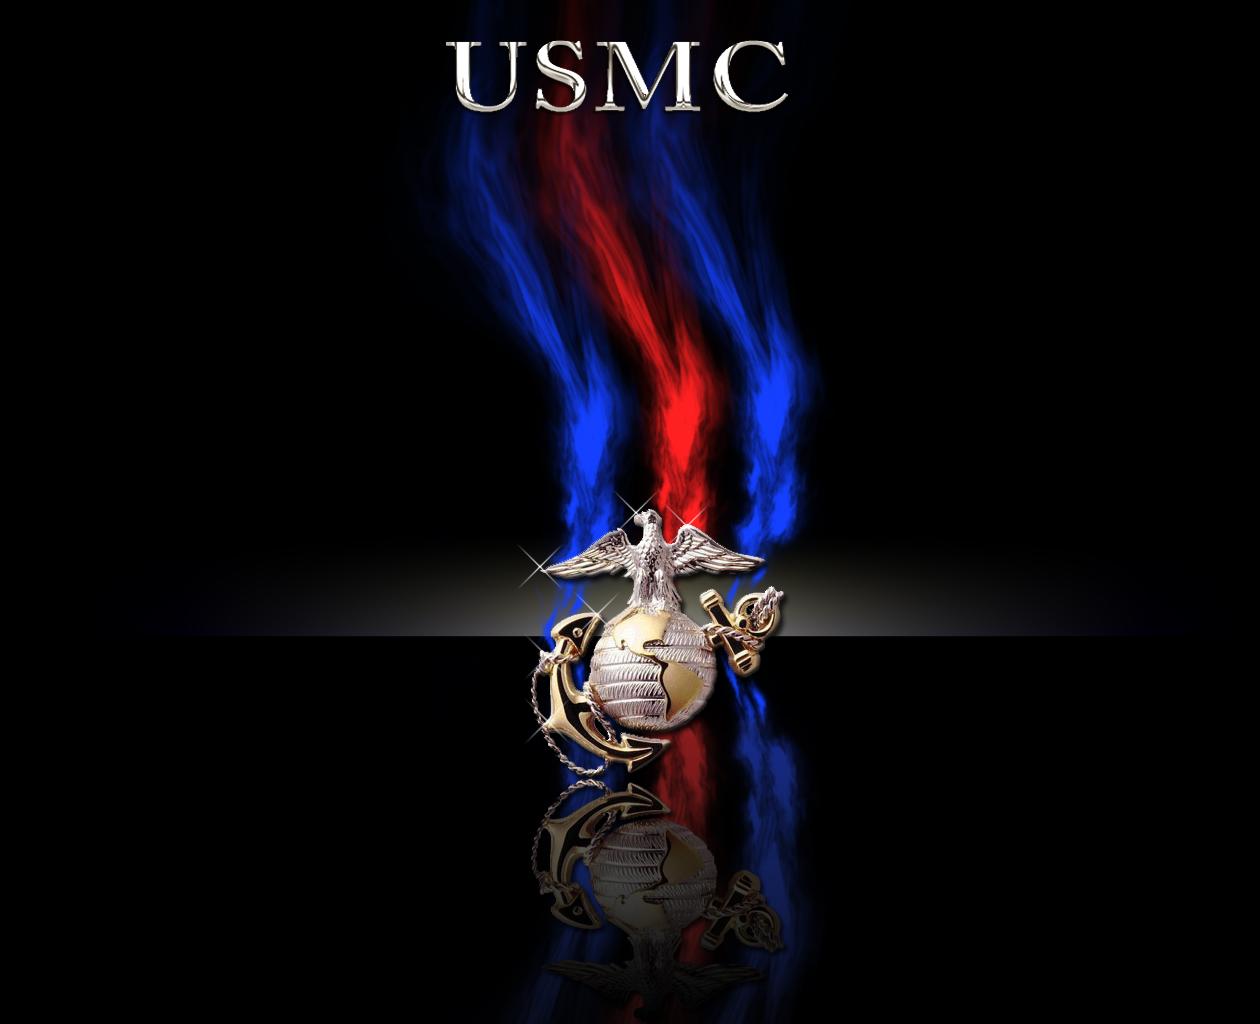 Marine Corp Desktop Wallpaper: Marine Corps Background Wallpaper